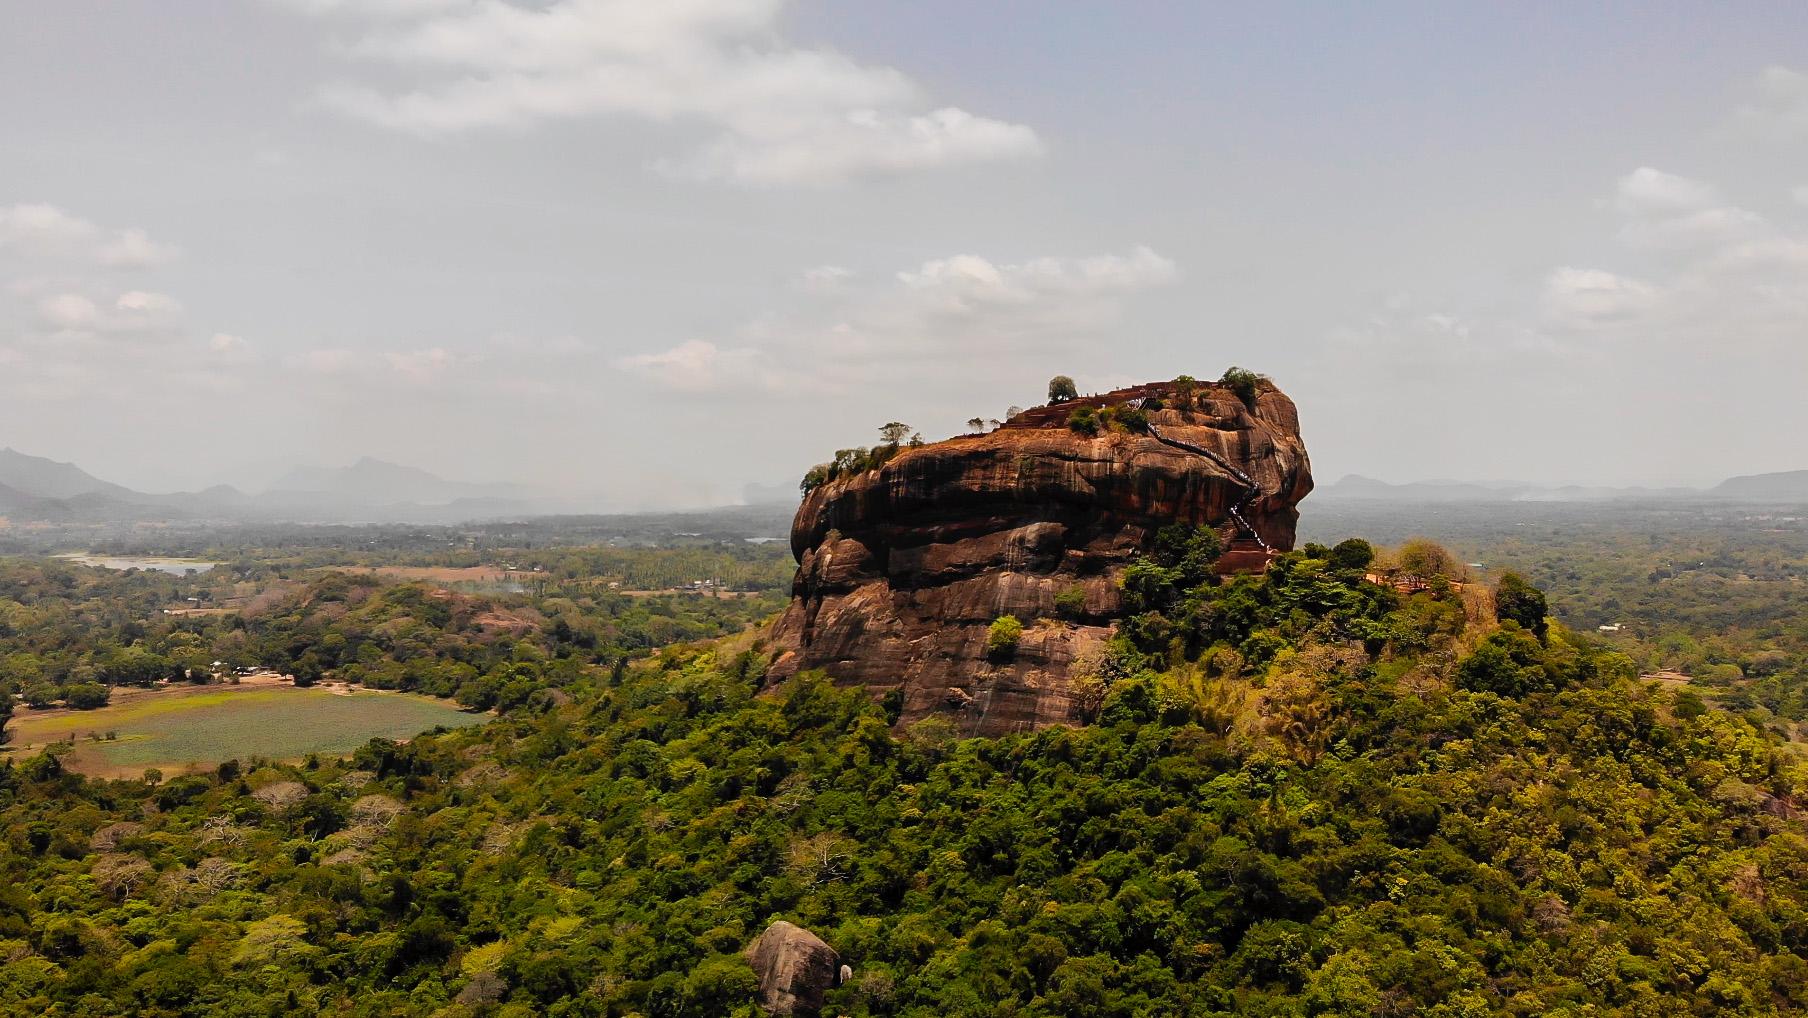 SriLanka_Ella_SigiriyaRock_drone.jpg